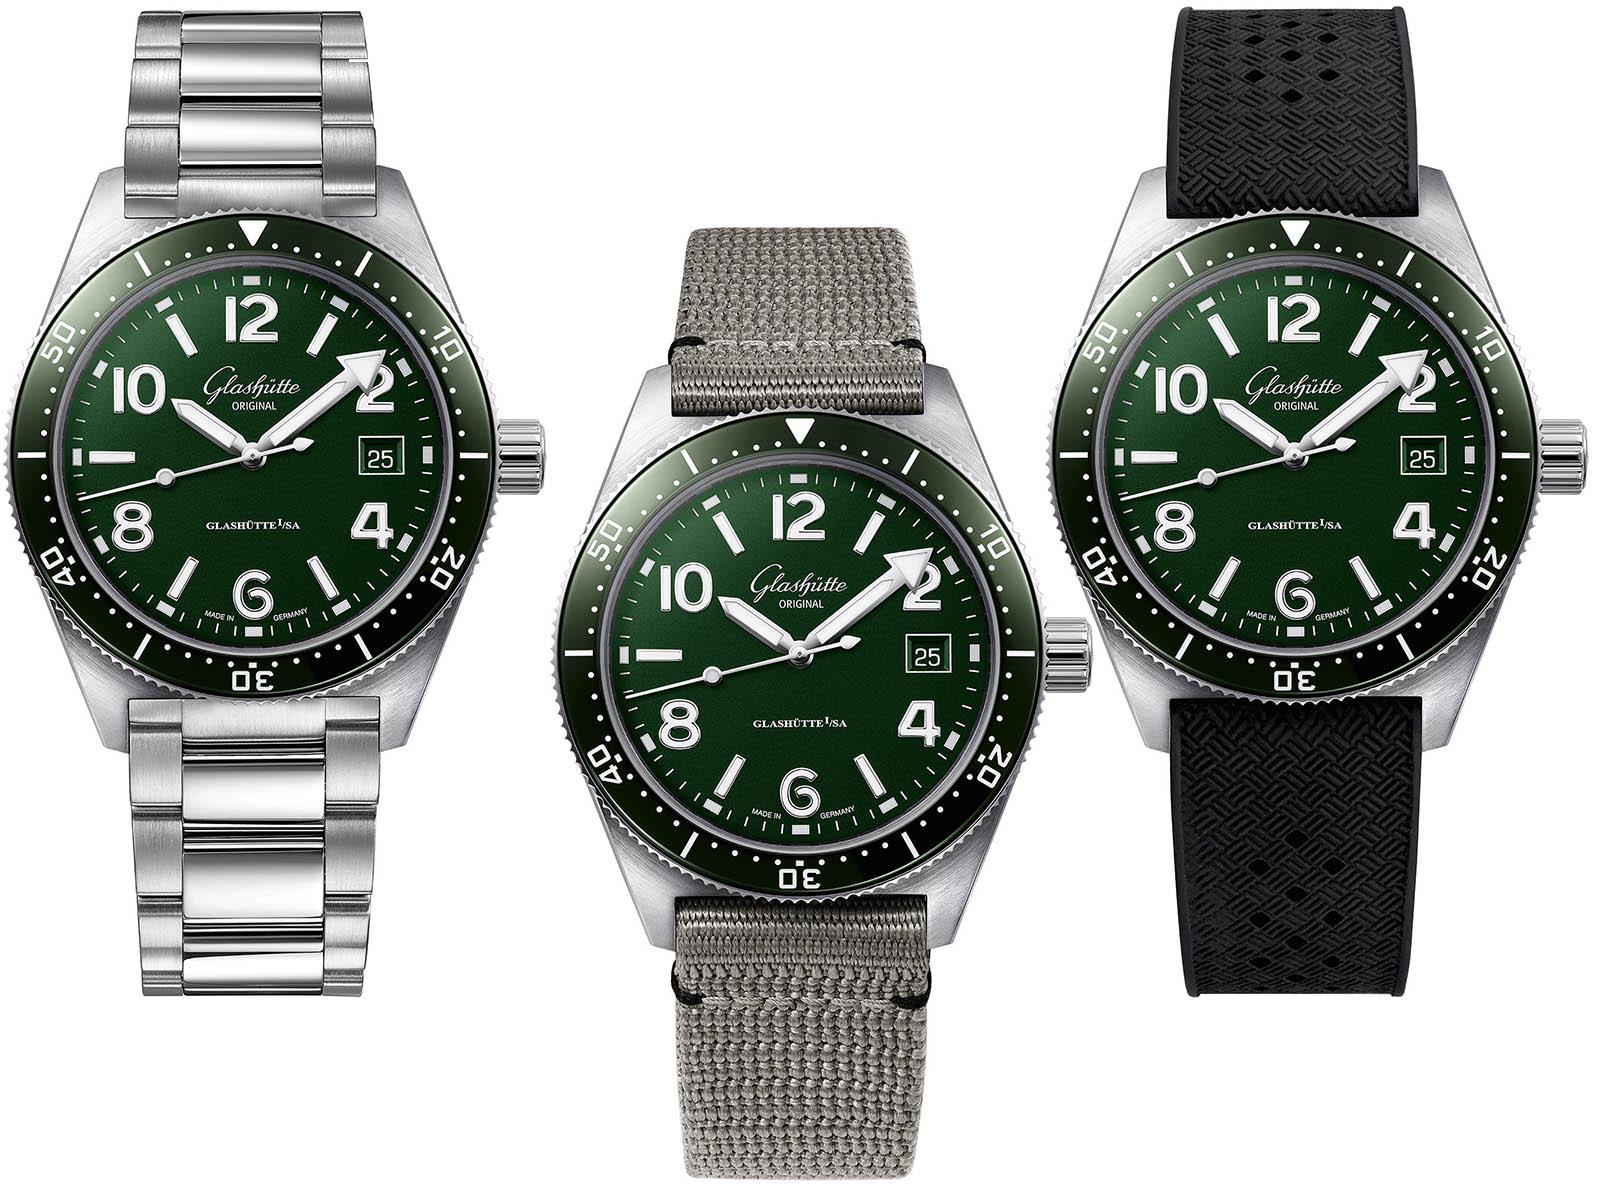 glashutte-original-seaq-reed-green-6.jpg